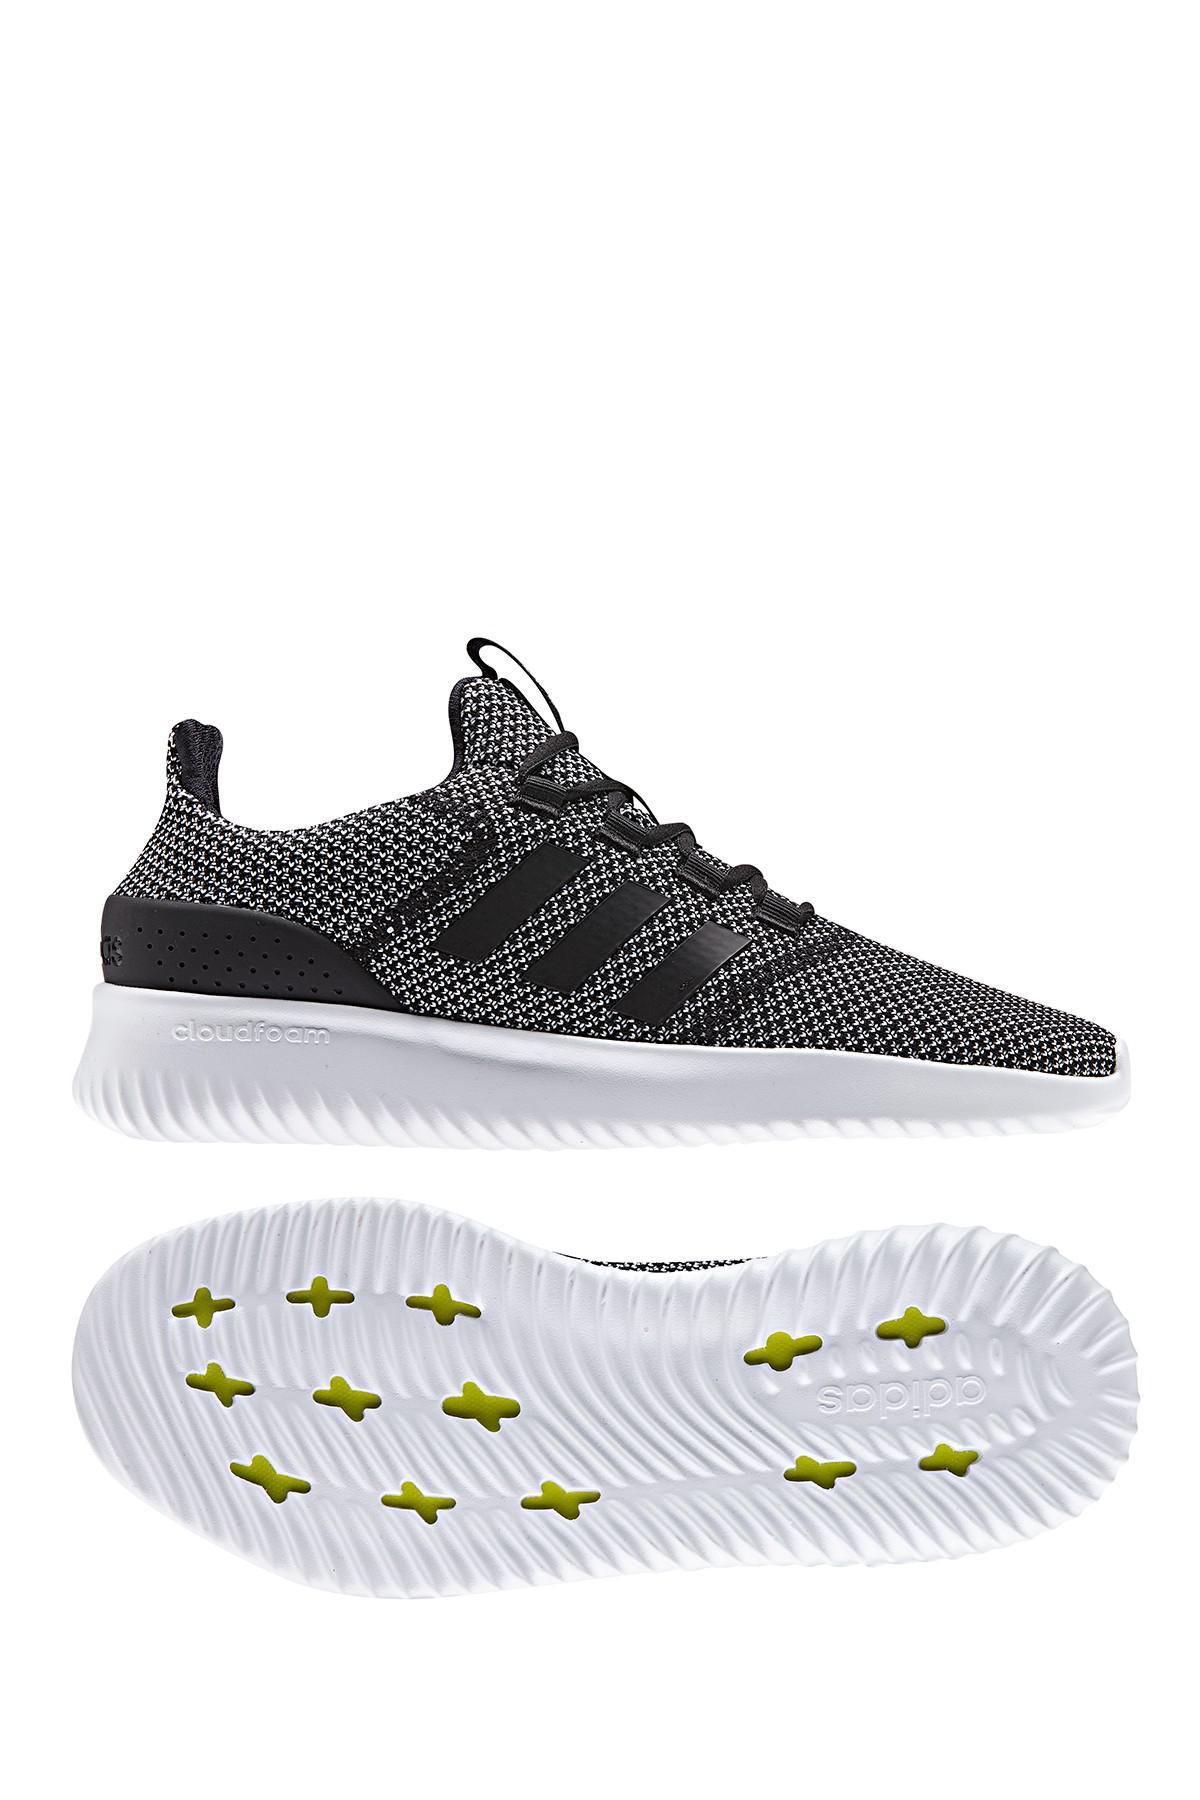 release date c92ed 408c5 Lyst - adidas Cloudfoam Ultimate Sneaker in Black for Men